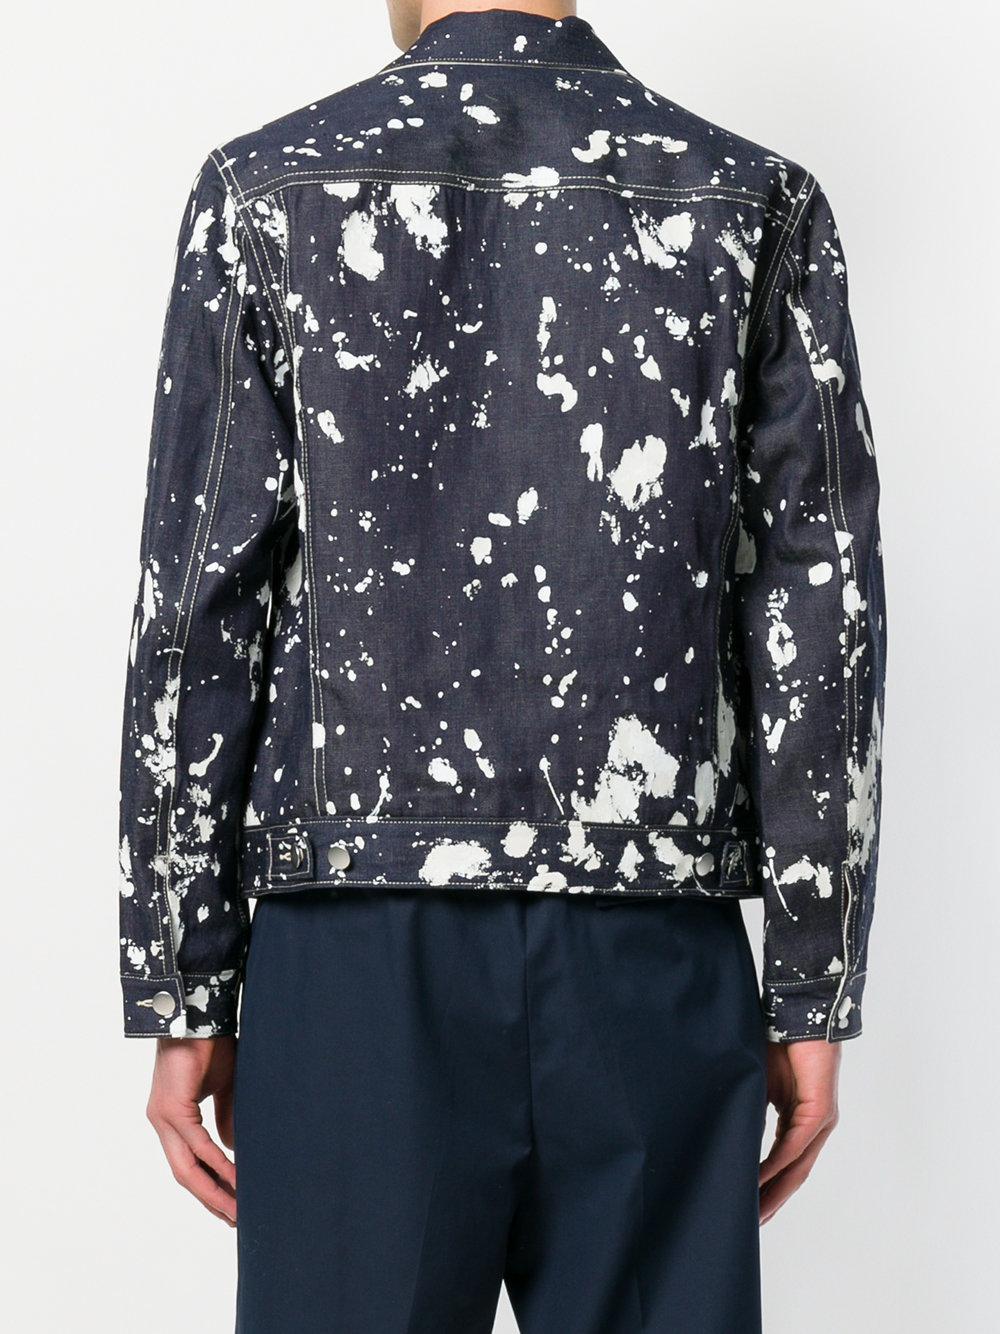 3.1 Phillip Lim Cotton Paint-effect Bomber Jacket in Blue for Men